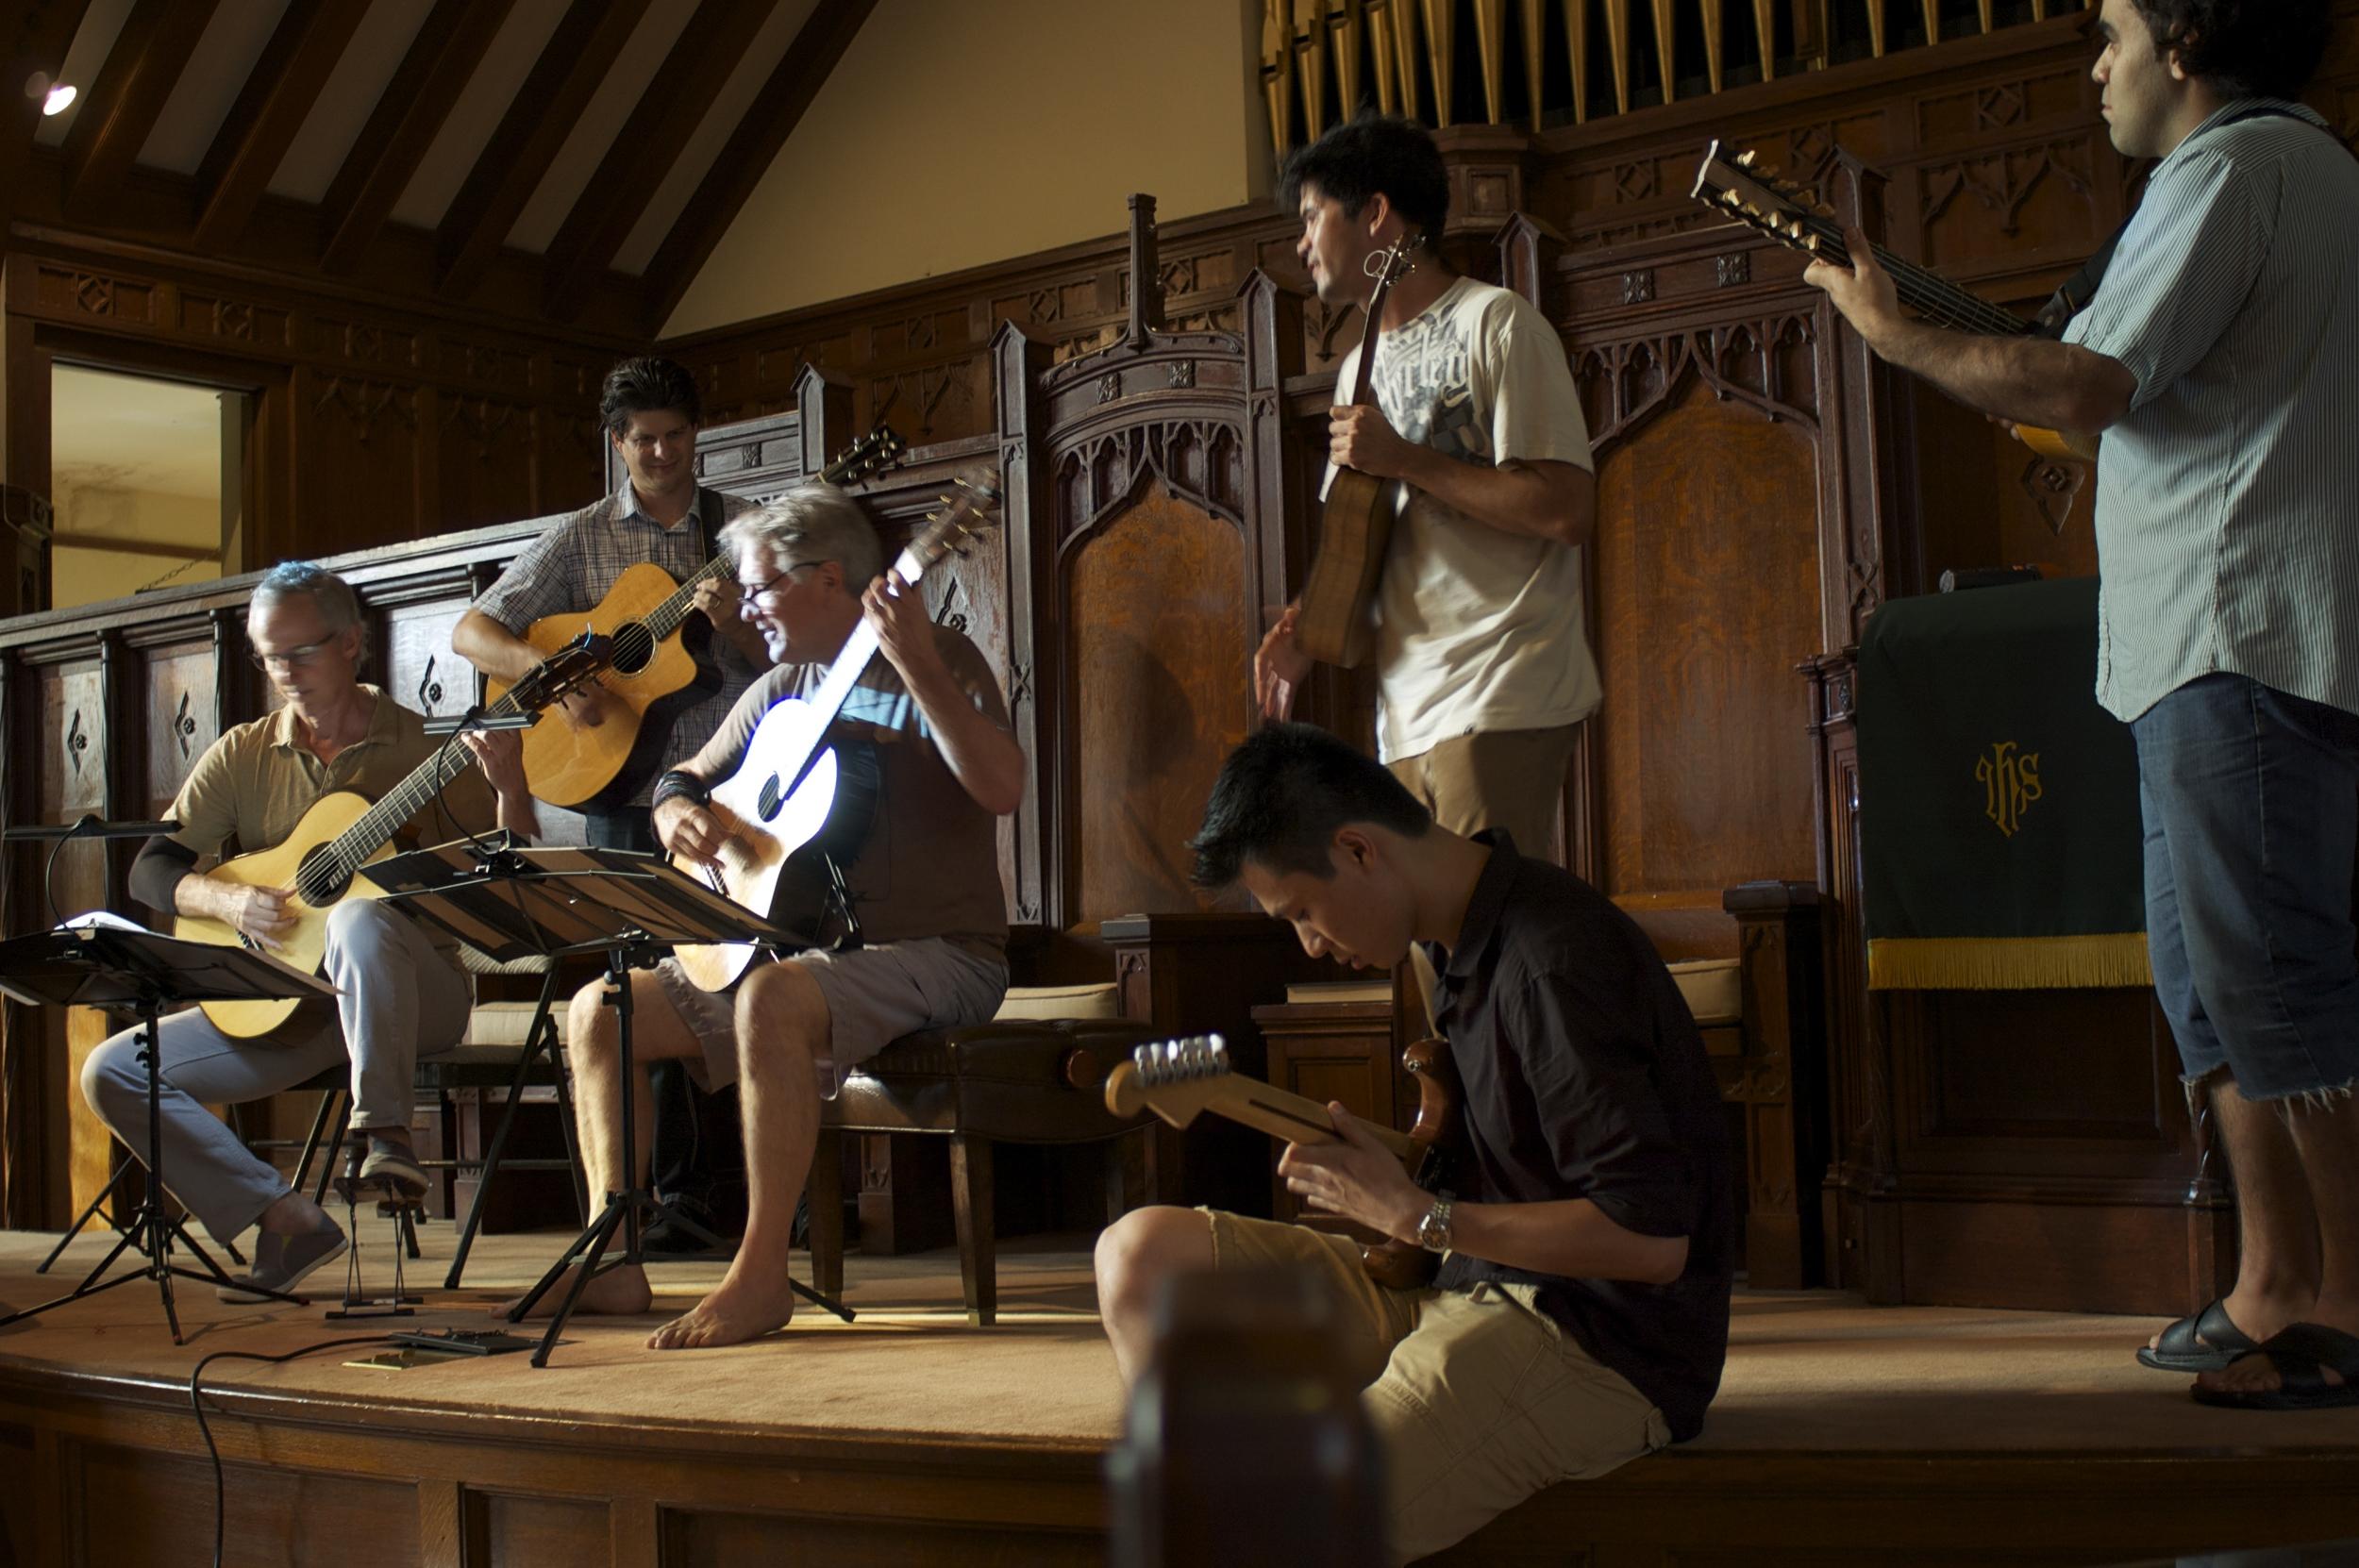 John Dearman, Jeff Peterson, Ben Verdery, Ray Zhou, Ian O'Sullivan, and Arash Noori rehearsing at Makawao Union Church (2014)